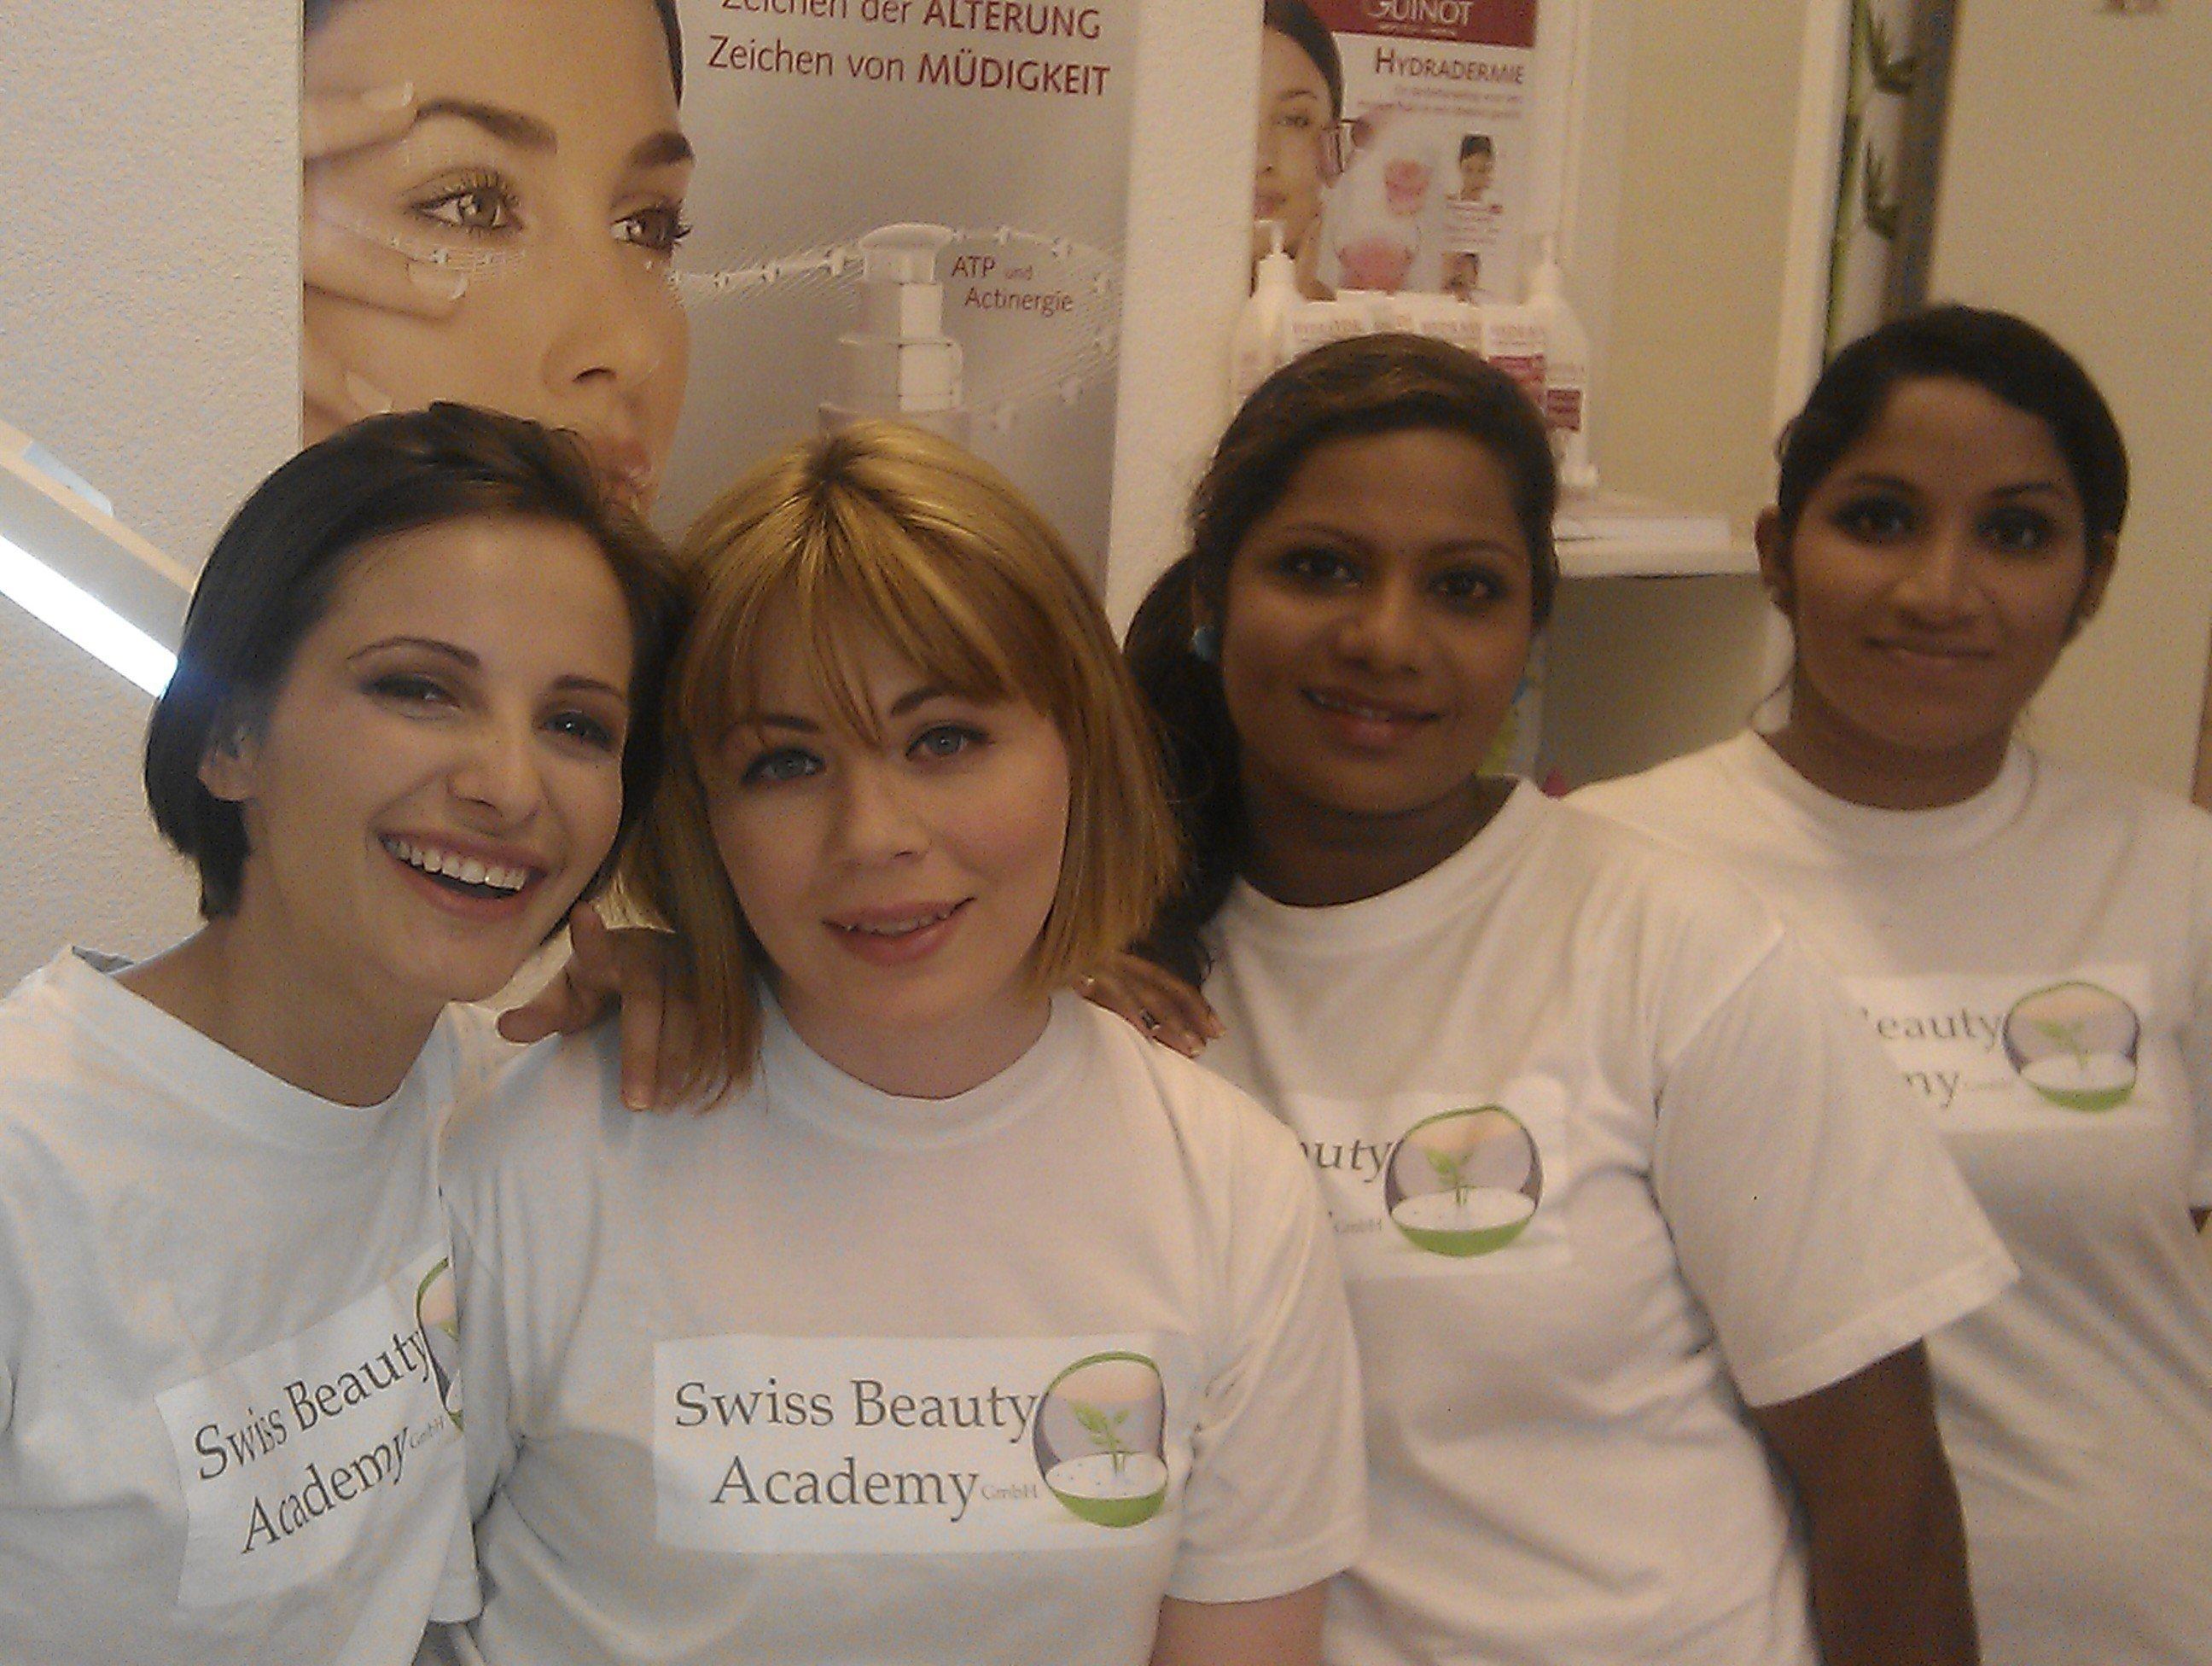 Swiss Beauty Academy GmbH